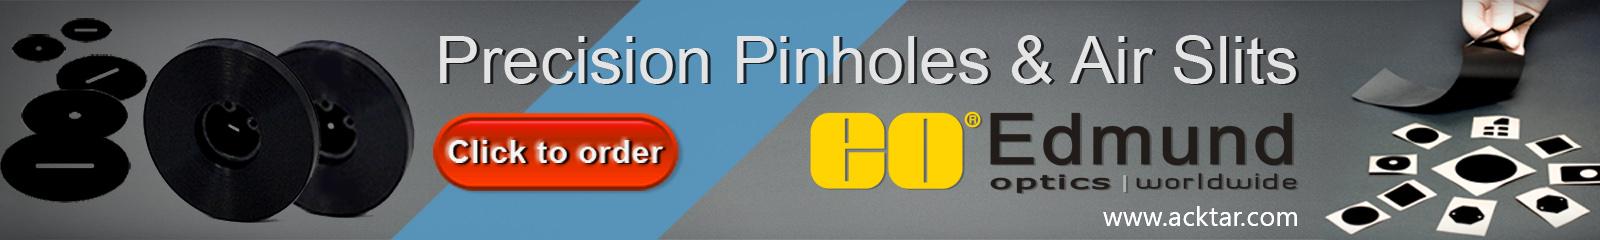 Precision pinholes banner